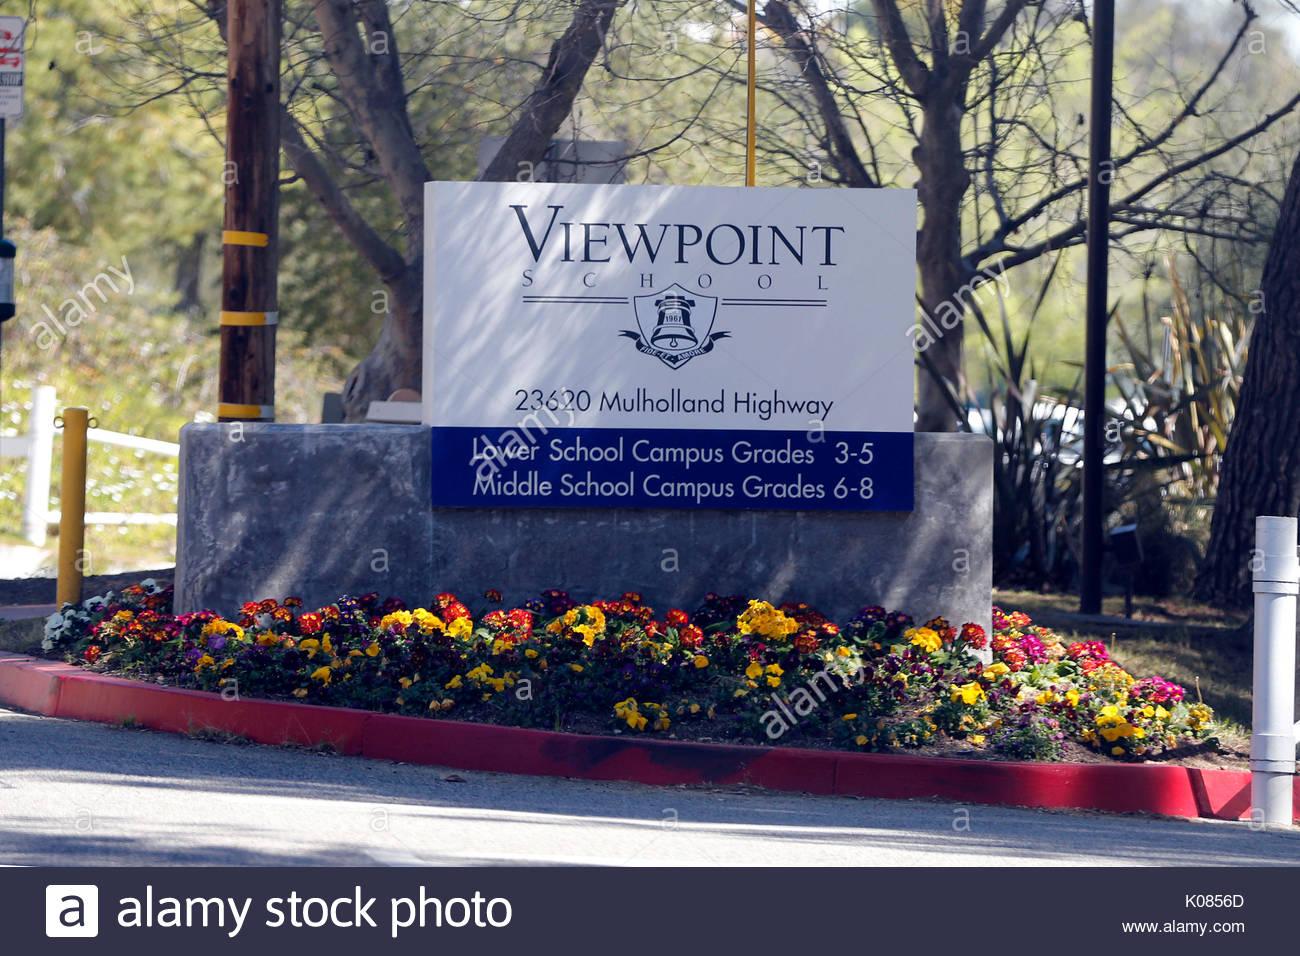 viewpoint school calabasas